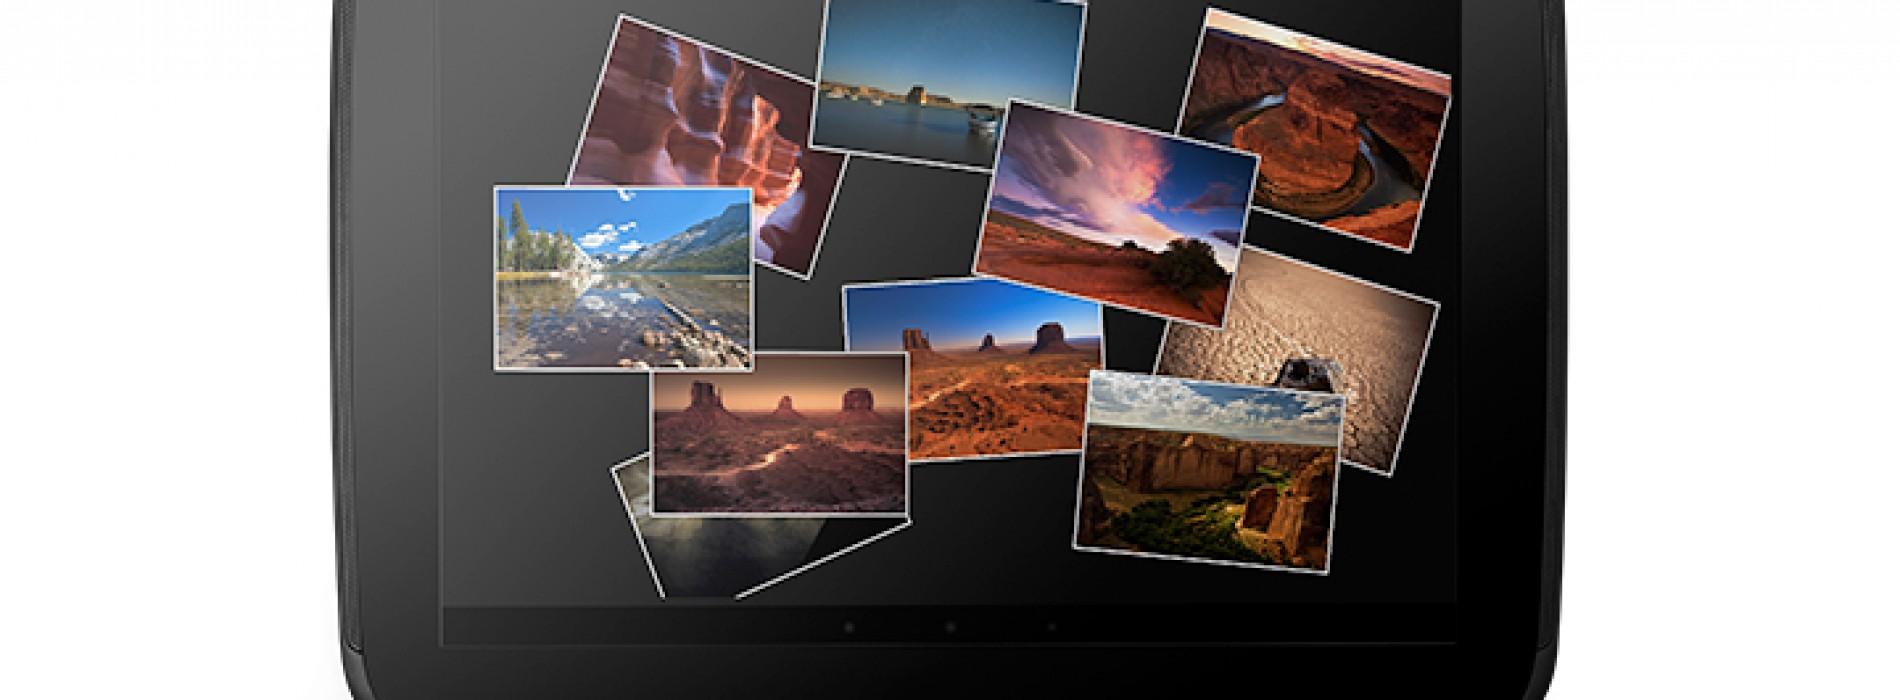 Nexus 10 falls just short of iPad 4 in benchmark comparisons